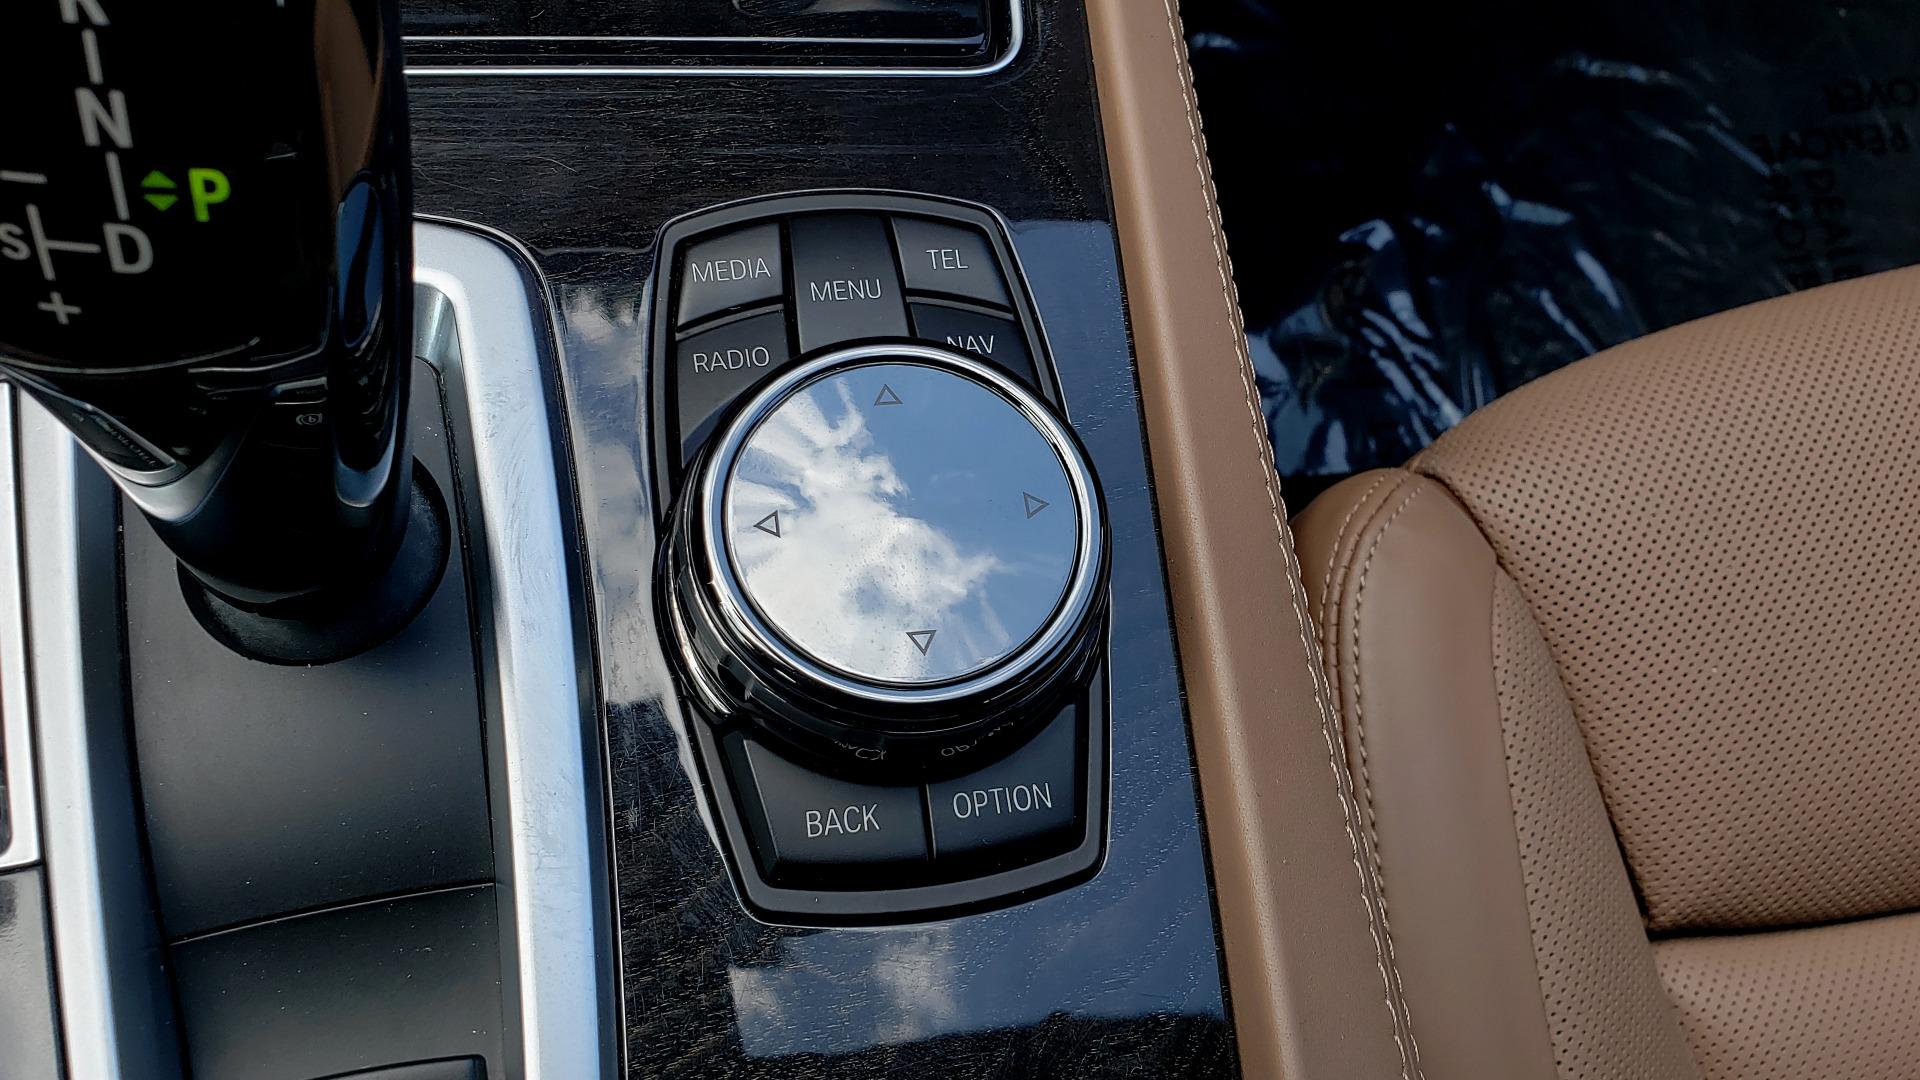 Used 2014 BMW 7 SERIES 750LI M-SPORT / EXEC PKG / DRVR ASST / LIGHTING / NAV / SUNROOF for sale Sold at Formula Imports in Charlotte NC 28227 47